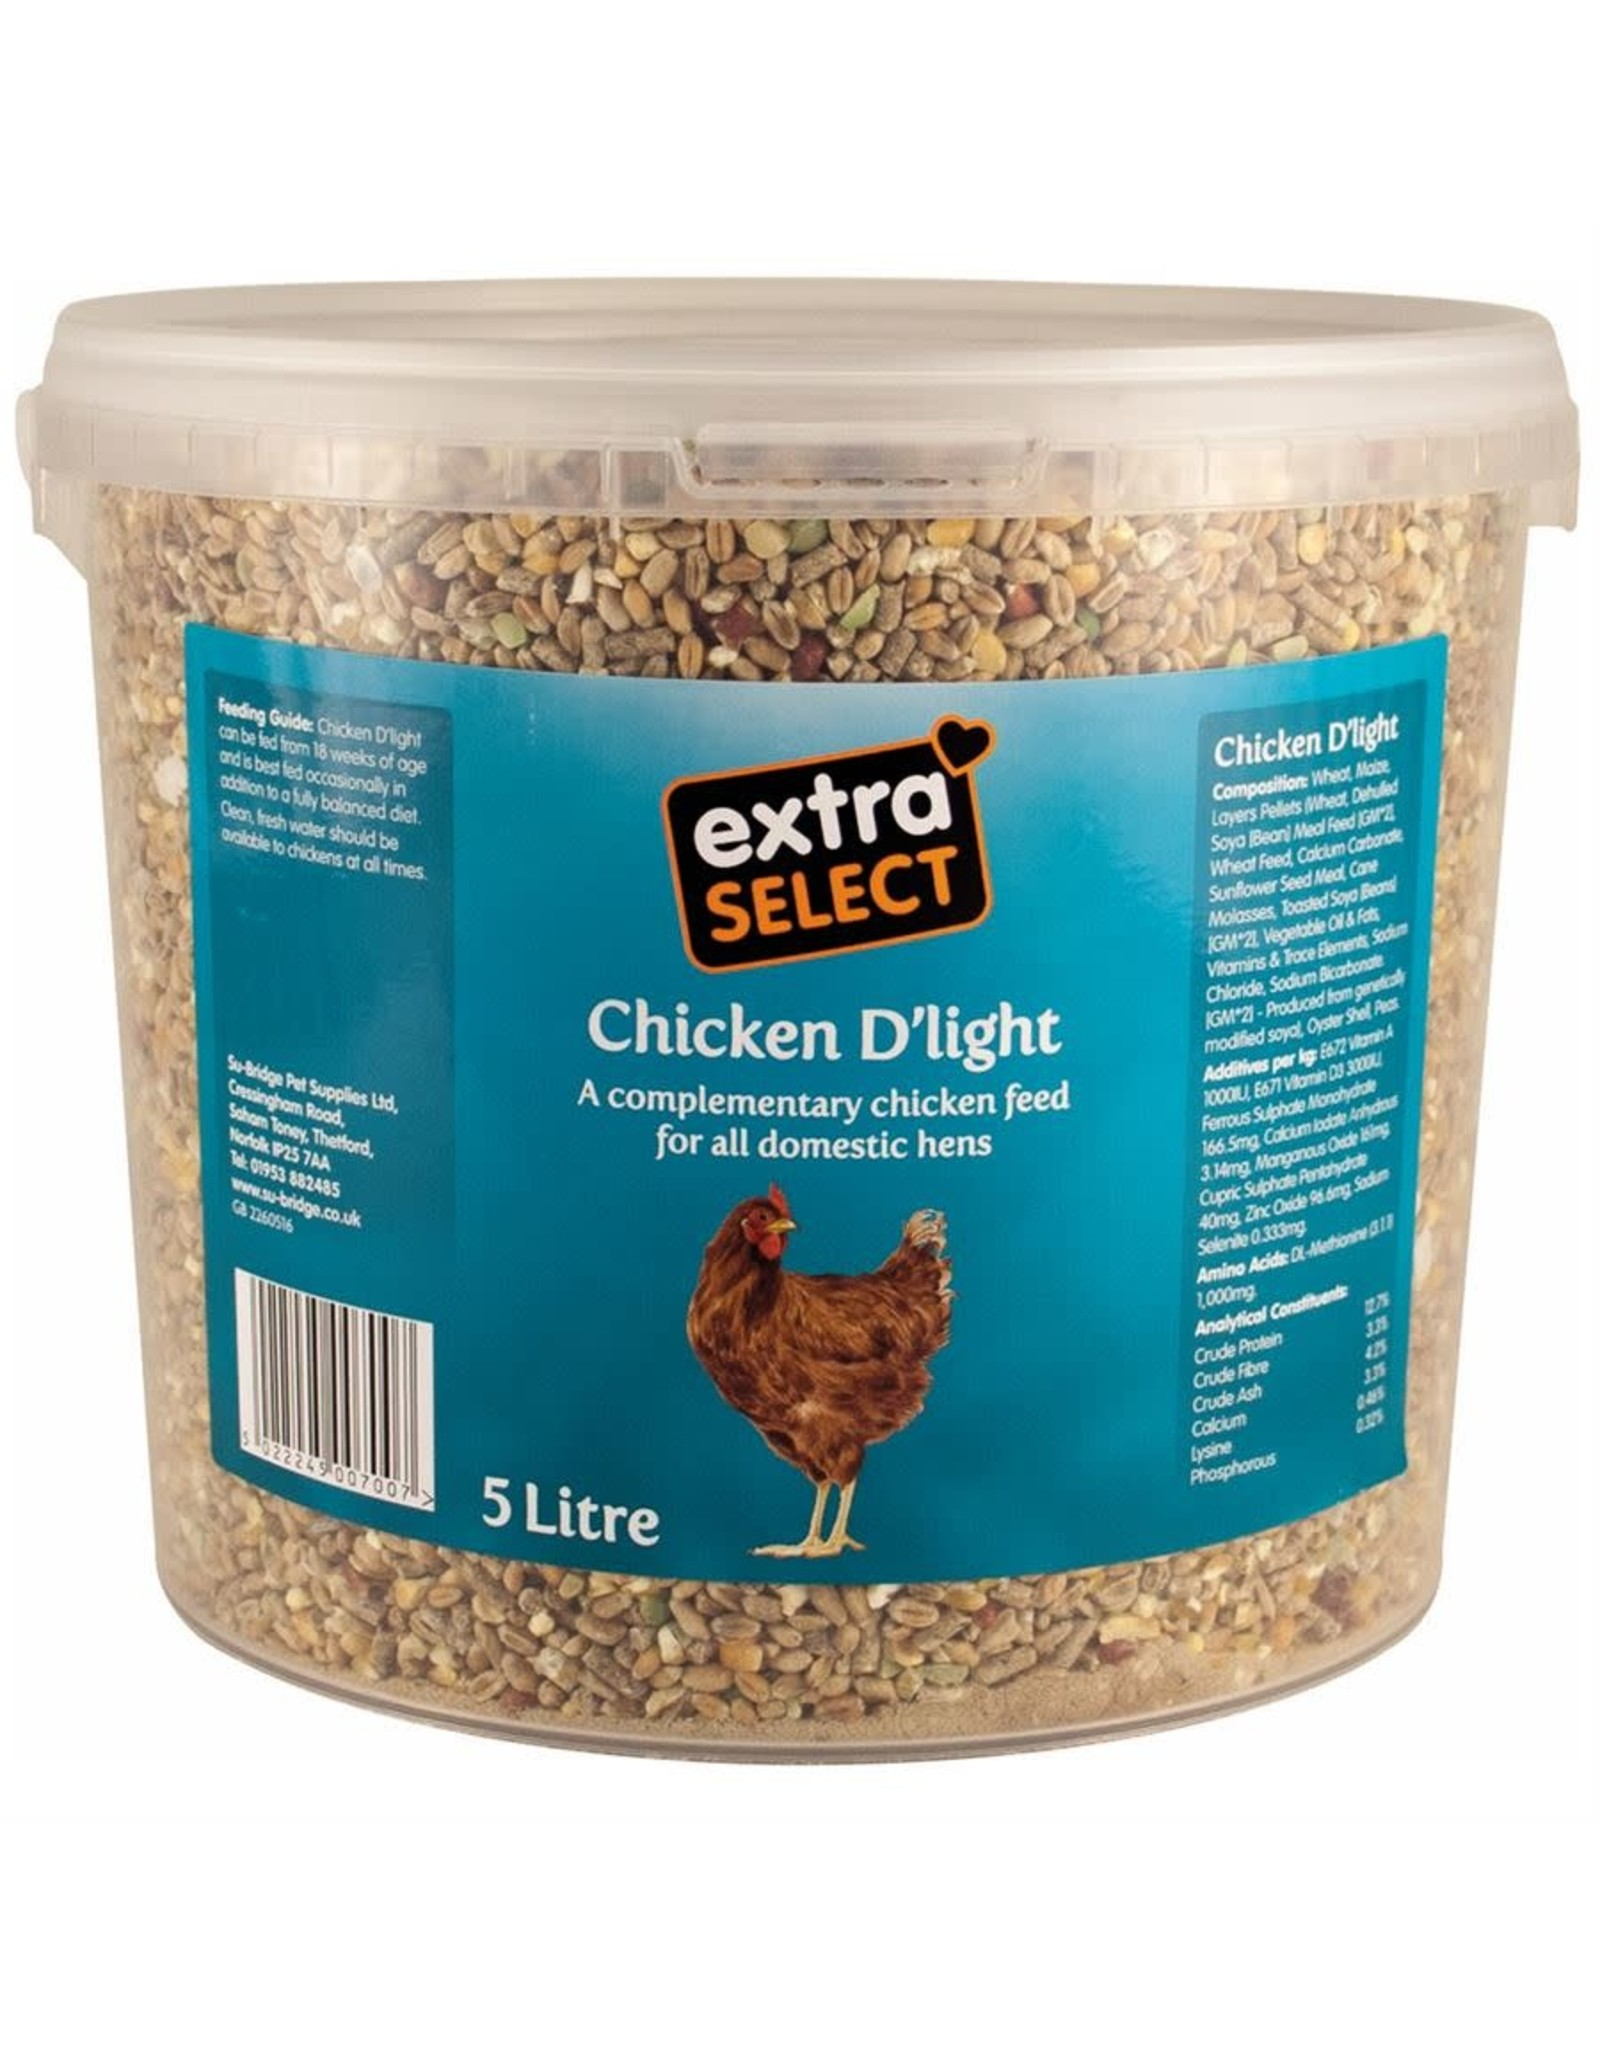 Extra Select Chicken D'Light Poultry Blend, 5 litre bucket